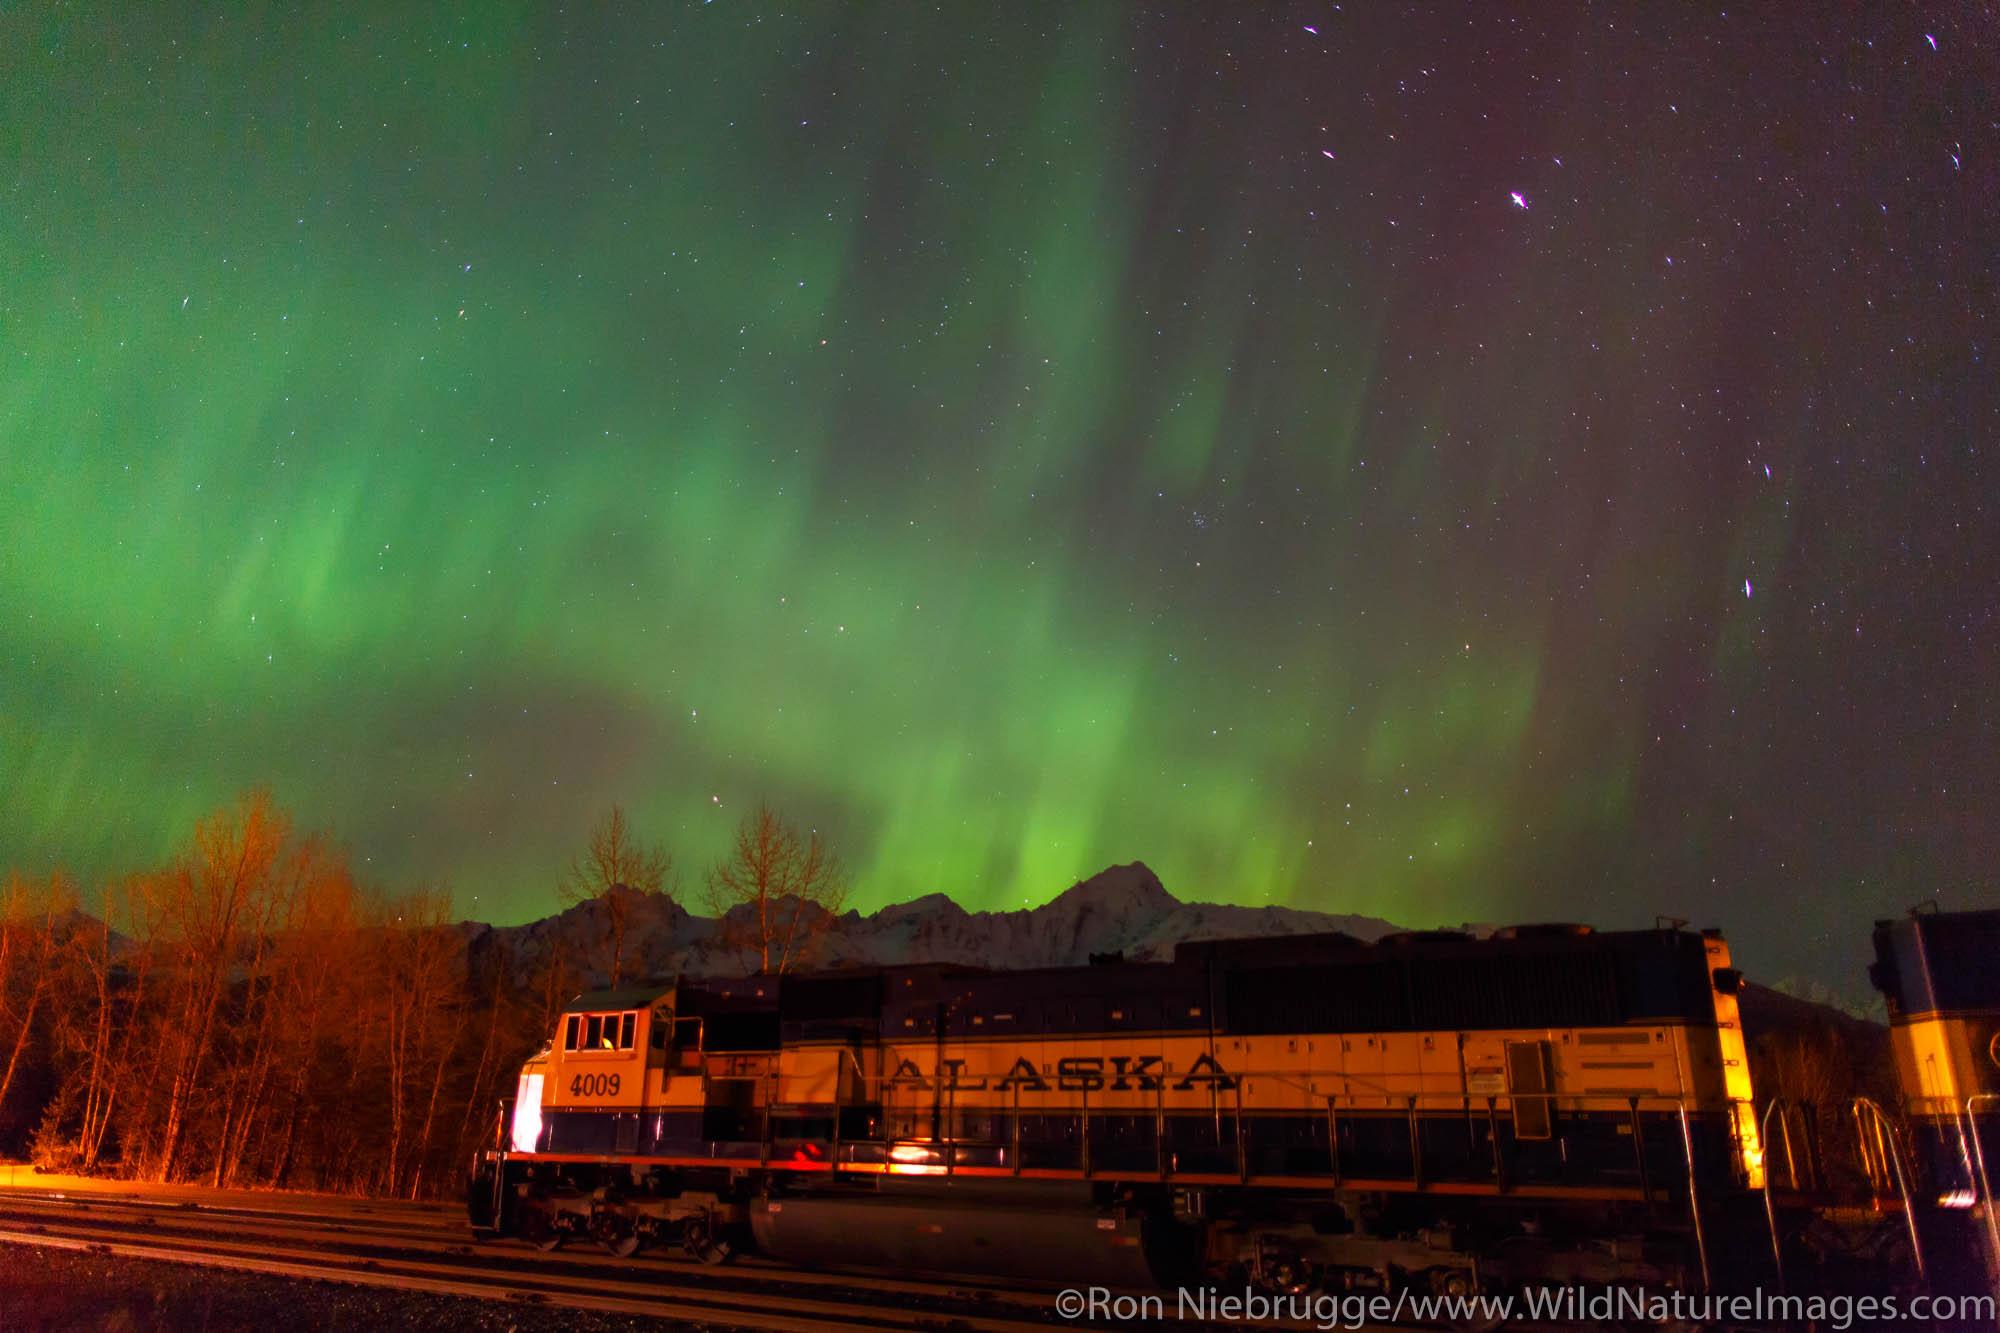 Aurora borealis over the Alaska Railroad, Seward, Alaska.